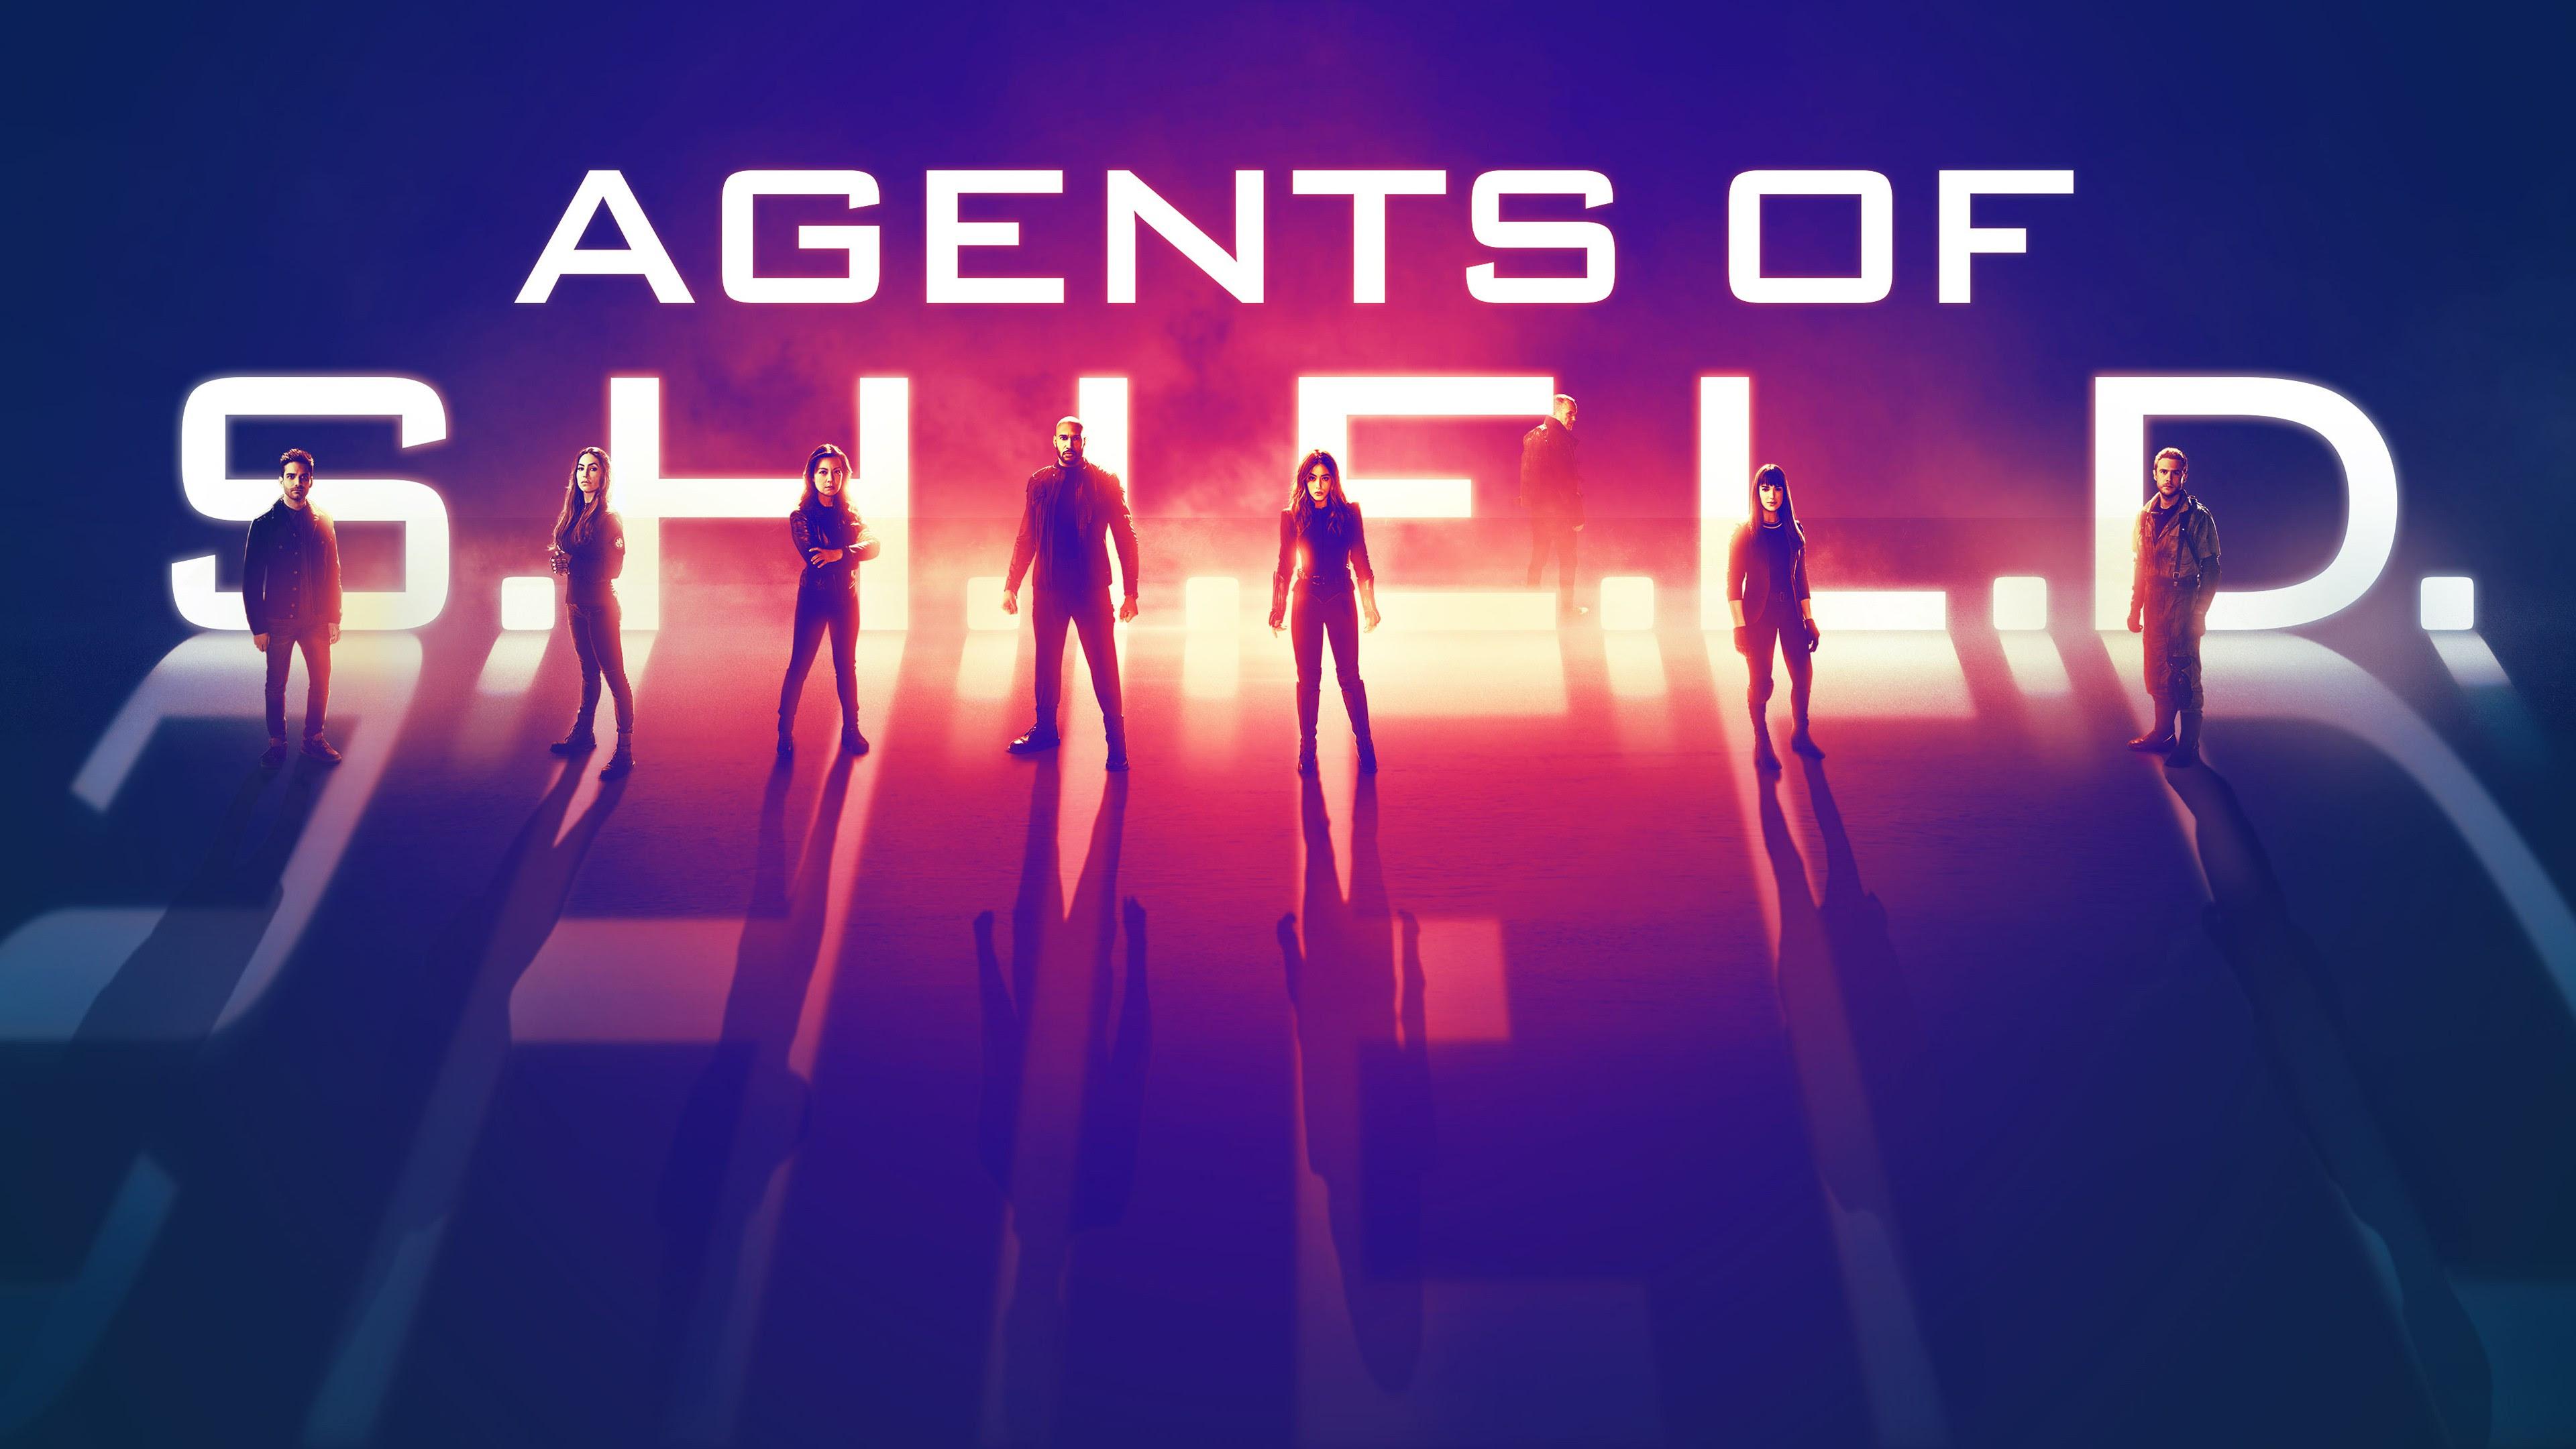 Agents Of Shield Season 6 2019 4k Wallpapers Hd Wallpapers